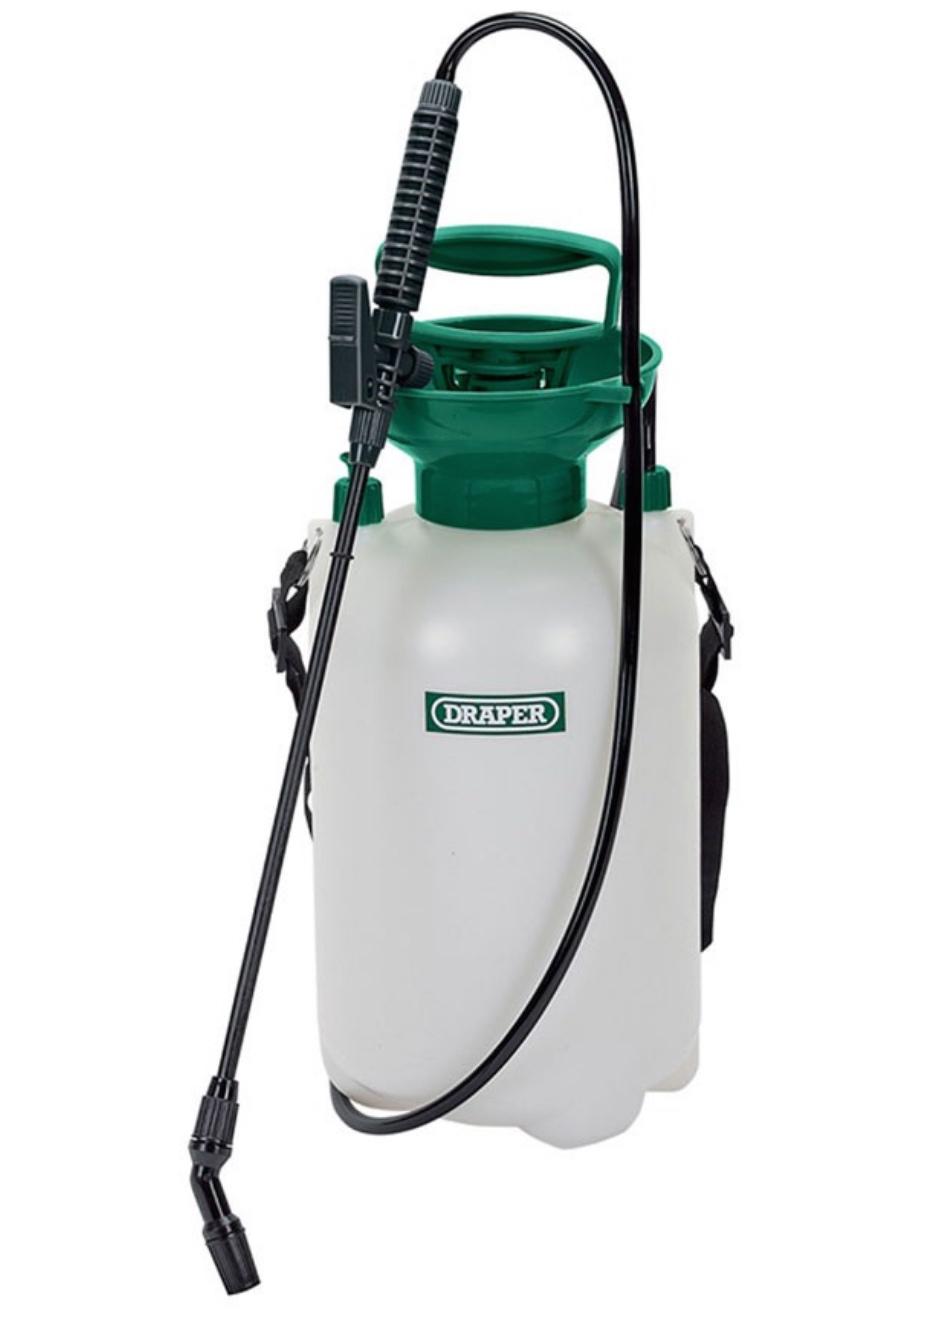 Draper 5L Garden Pressure Sprayer £5.92 @ Robert Dyas (free c+c)